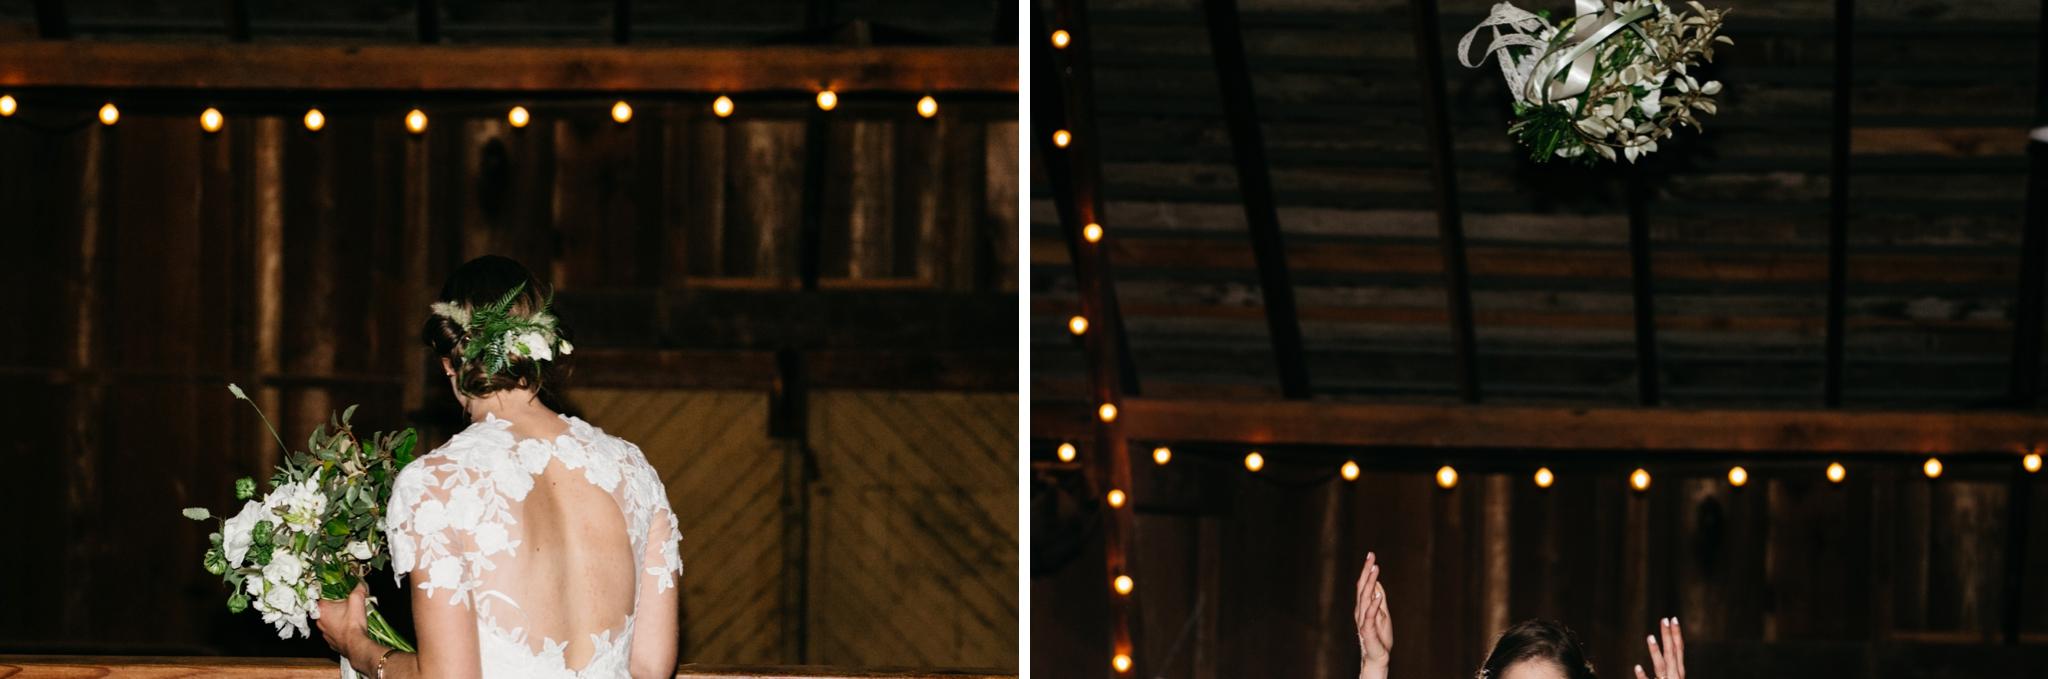 Runnymede sculpture farm wedding, Runnymede sculpture farm wedding photos, Northern California wedding photographer, bay area wedding photographer, Bay Area wedding venue, documentary wedding photographer, destination wedding photographer, candid wedding photographer, Runnymede farm, Bay Area wedding photography, California wedding photographer, LA wedding photographer, Palm Springs wedding photographer, SF wedding photography, East bay wedding photographer